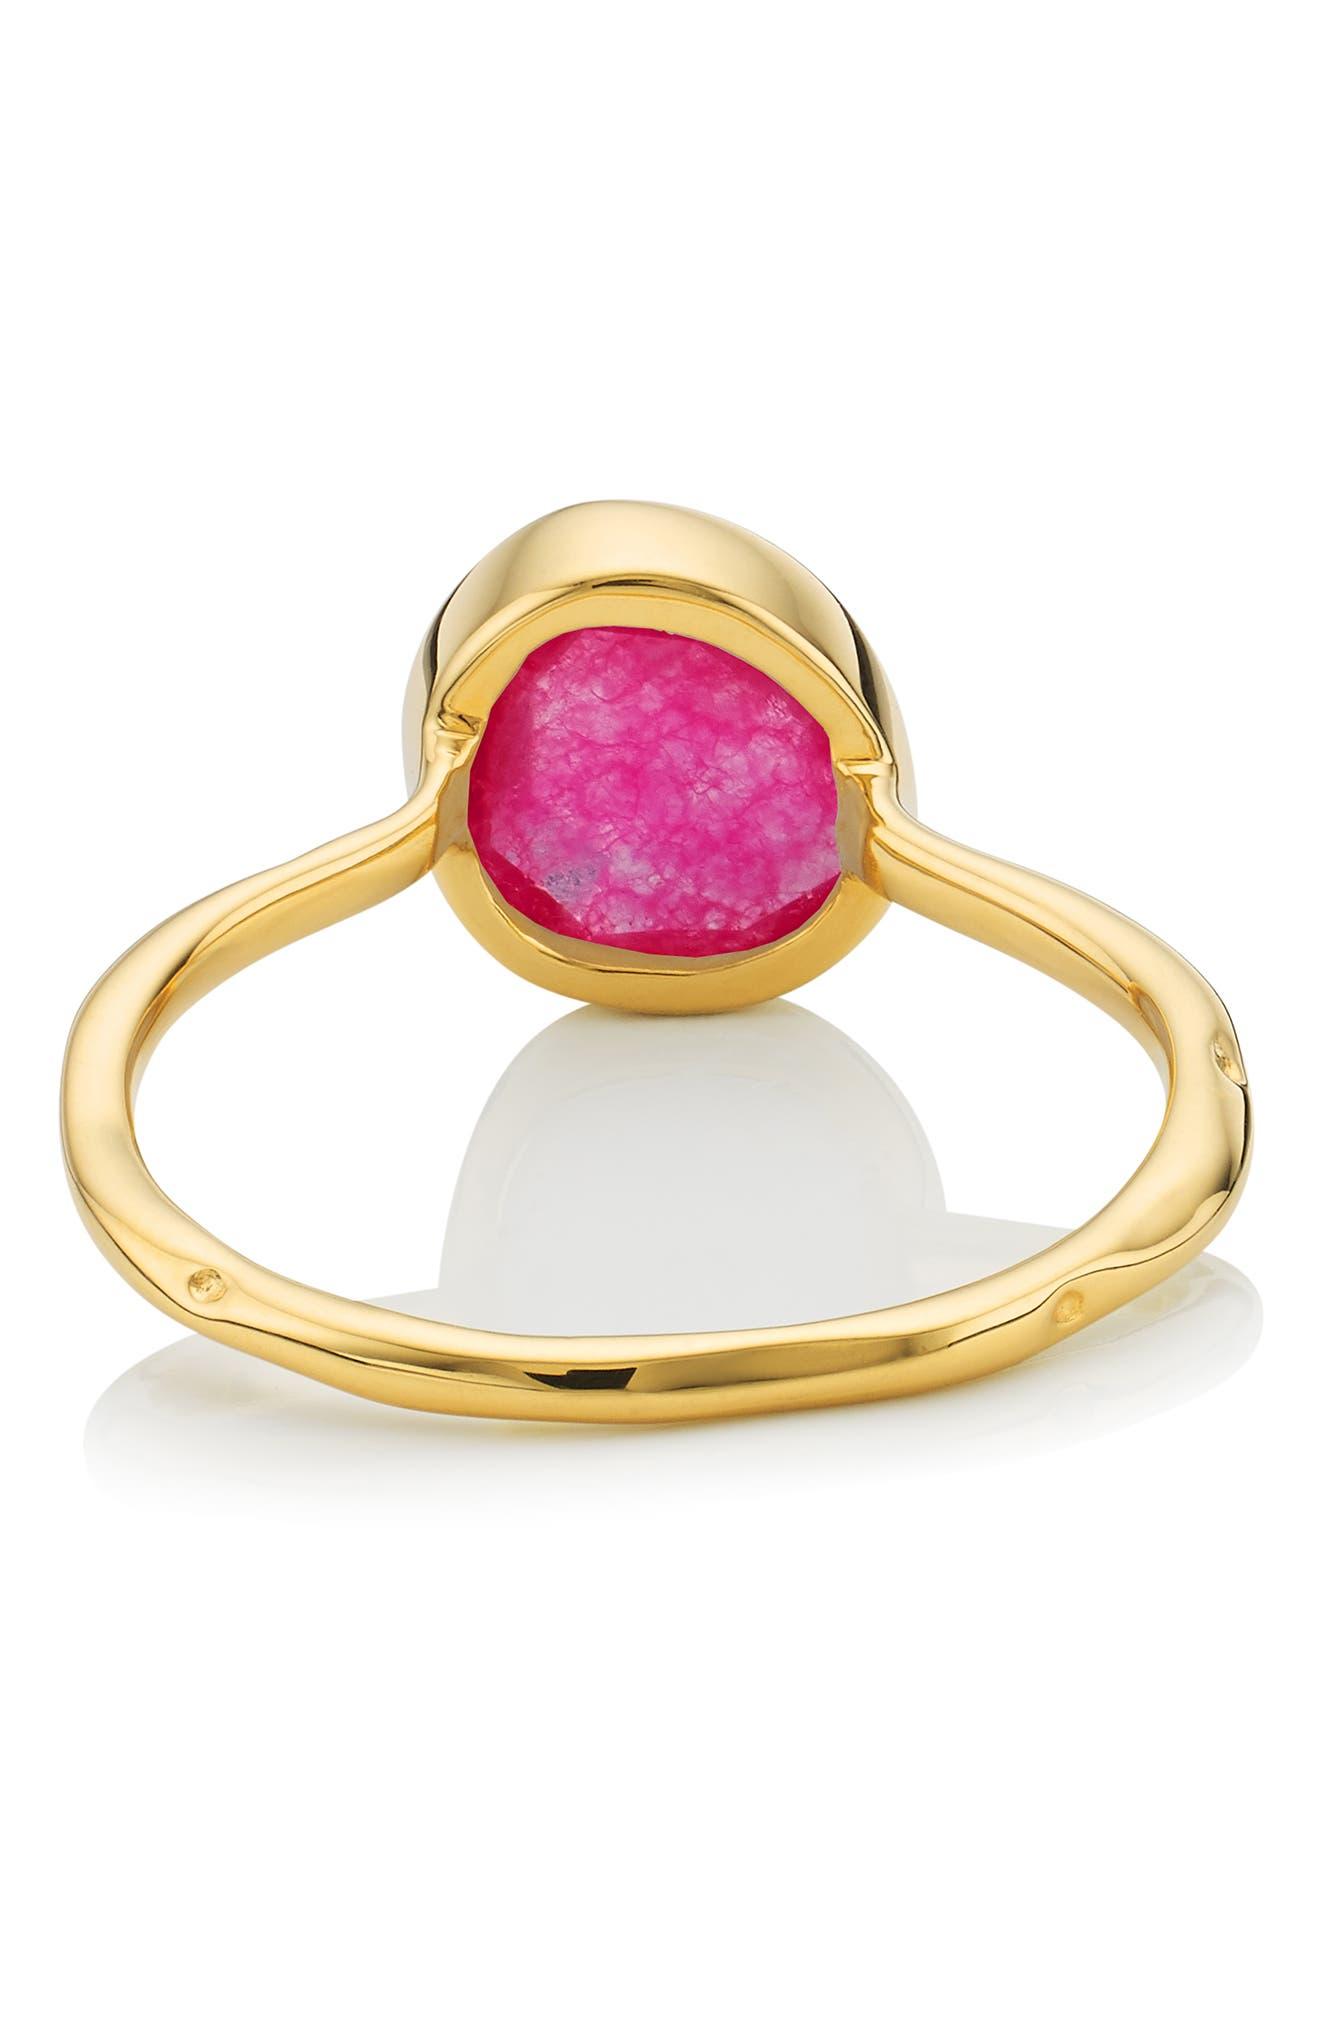 MONICA VINADER, Siren Semiprecious Stone Stacking Ring, Alternate thumbnail 3, color, GOLD/ PINK QUARTZ